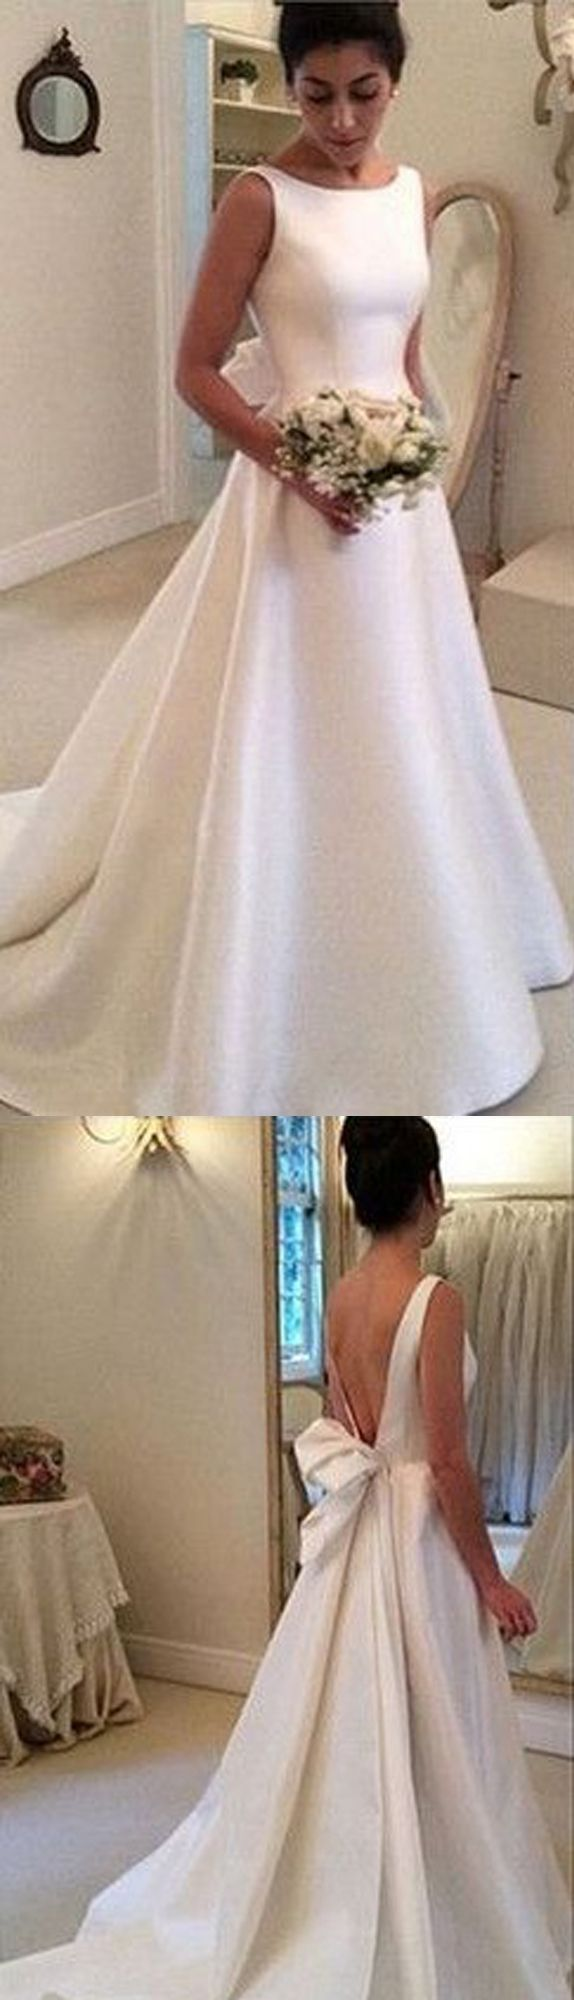 Simple Formal Wedding Dresses